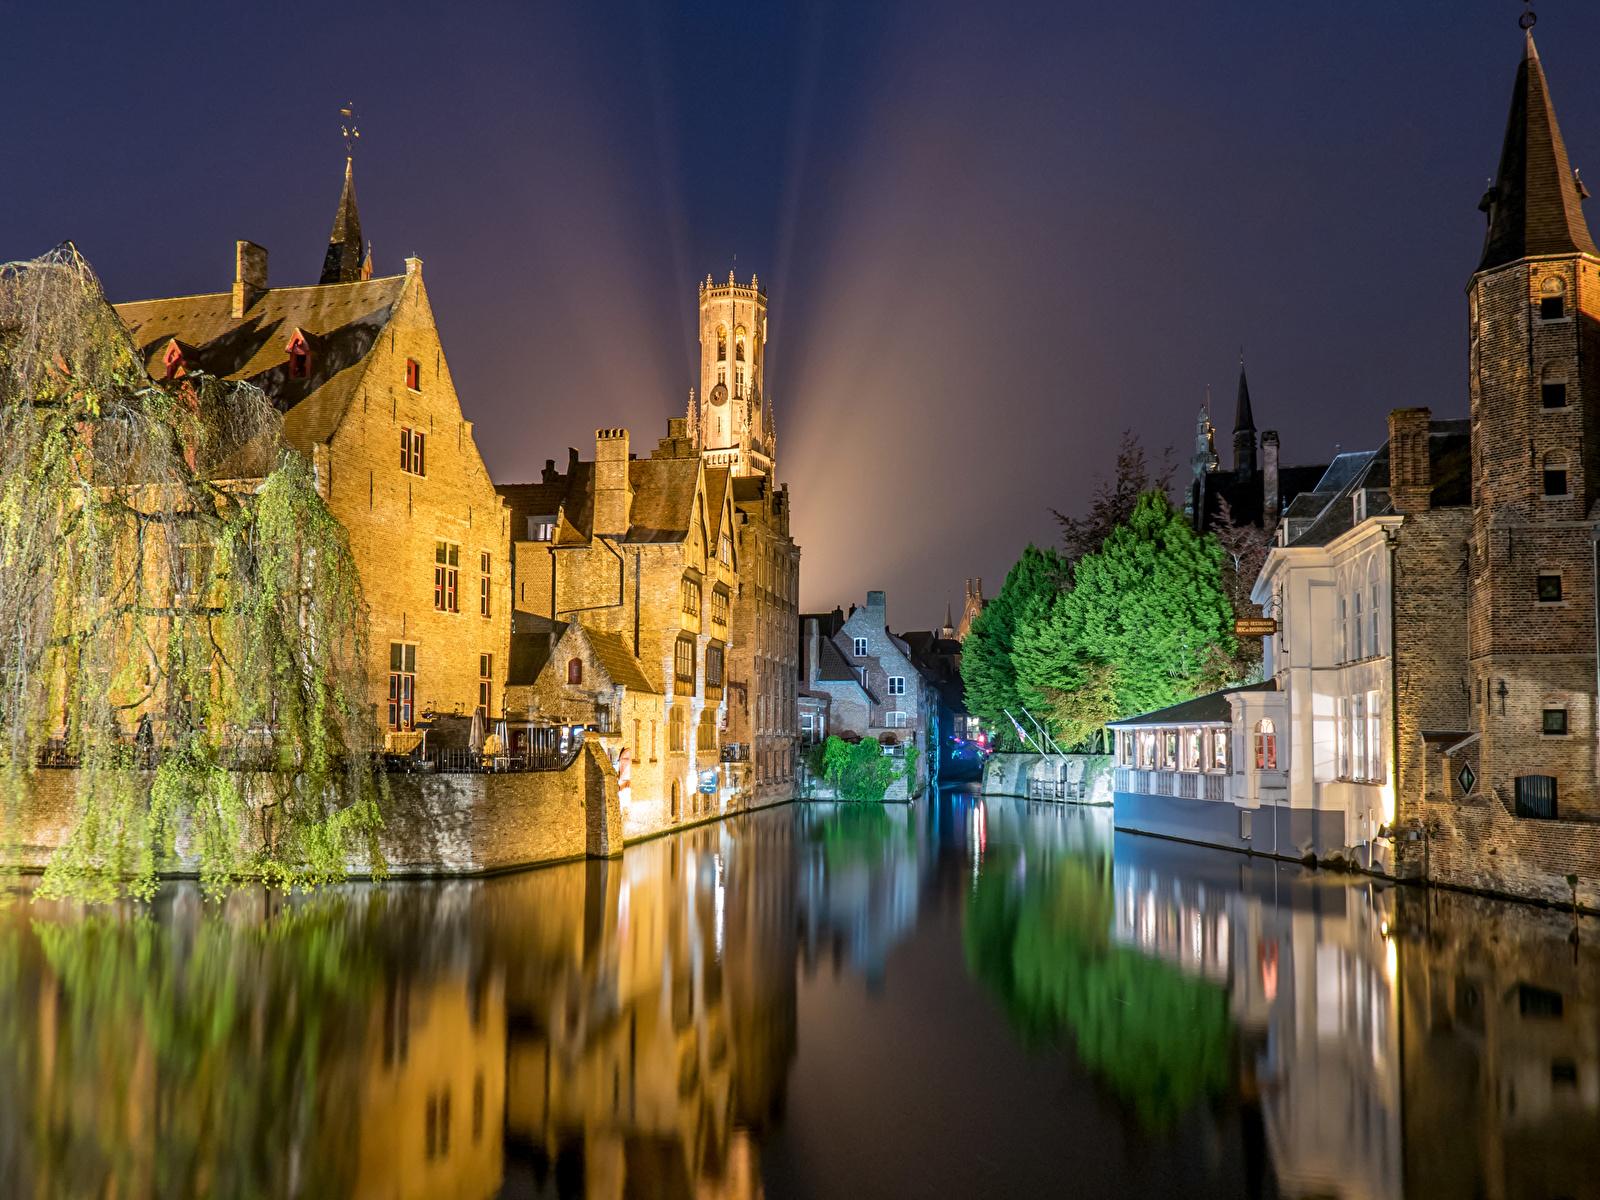 Wallpaper Belgium Brugge Night Rivers Cities Houses 1600x1200 1600x1200